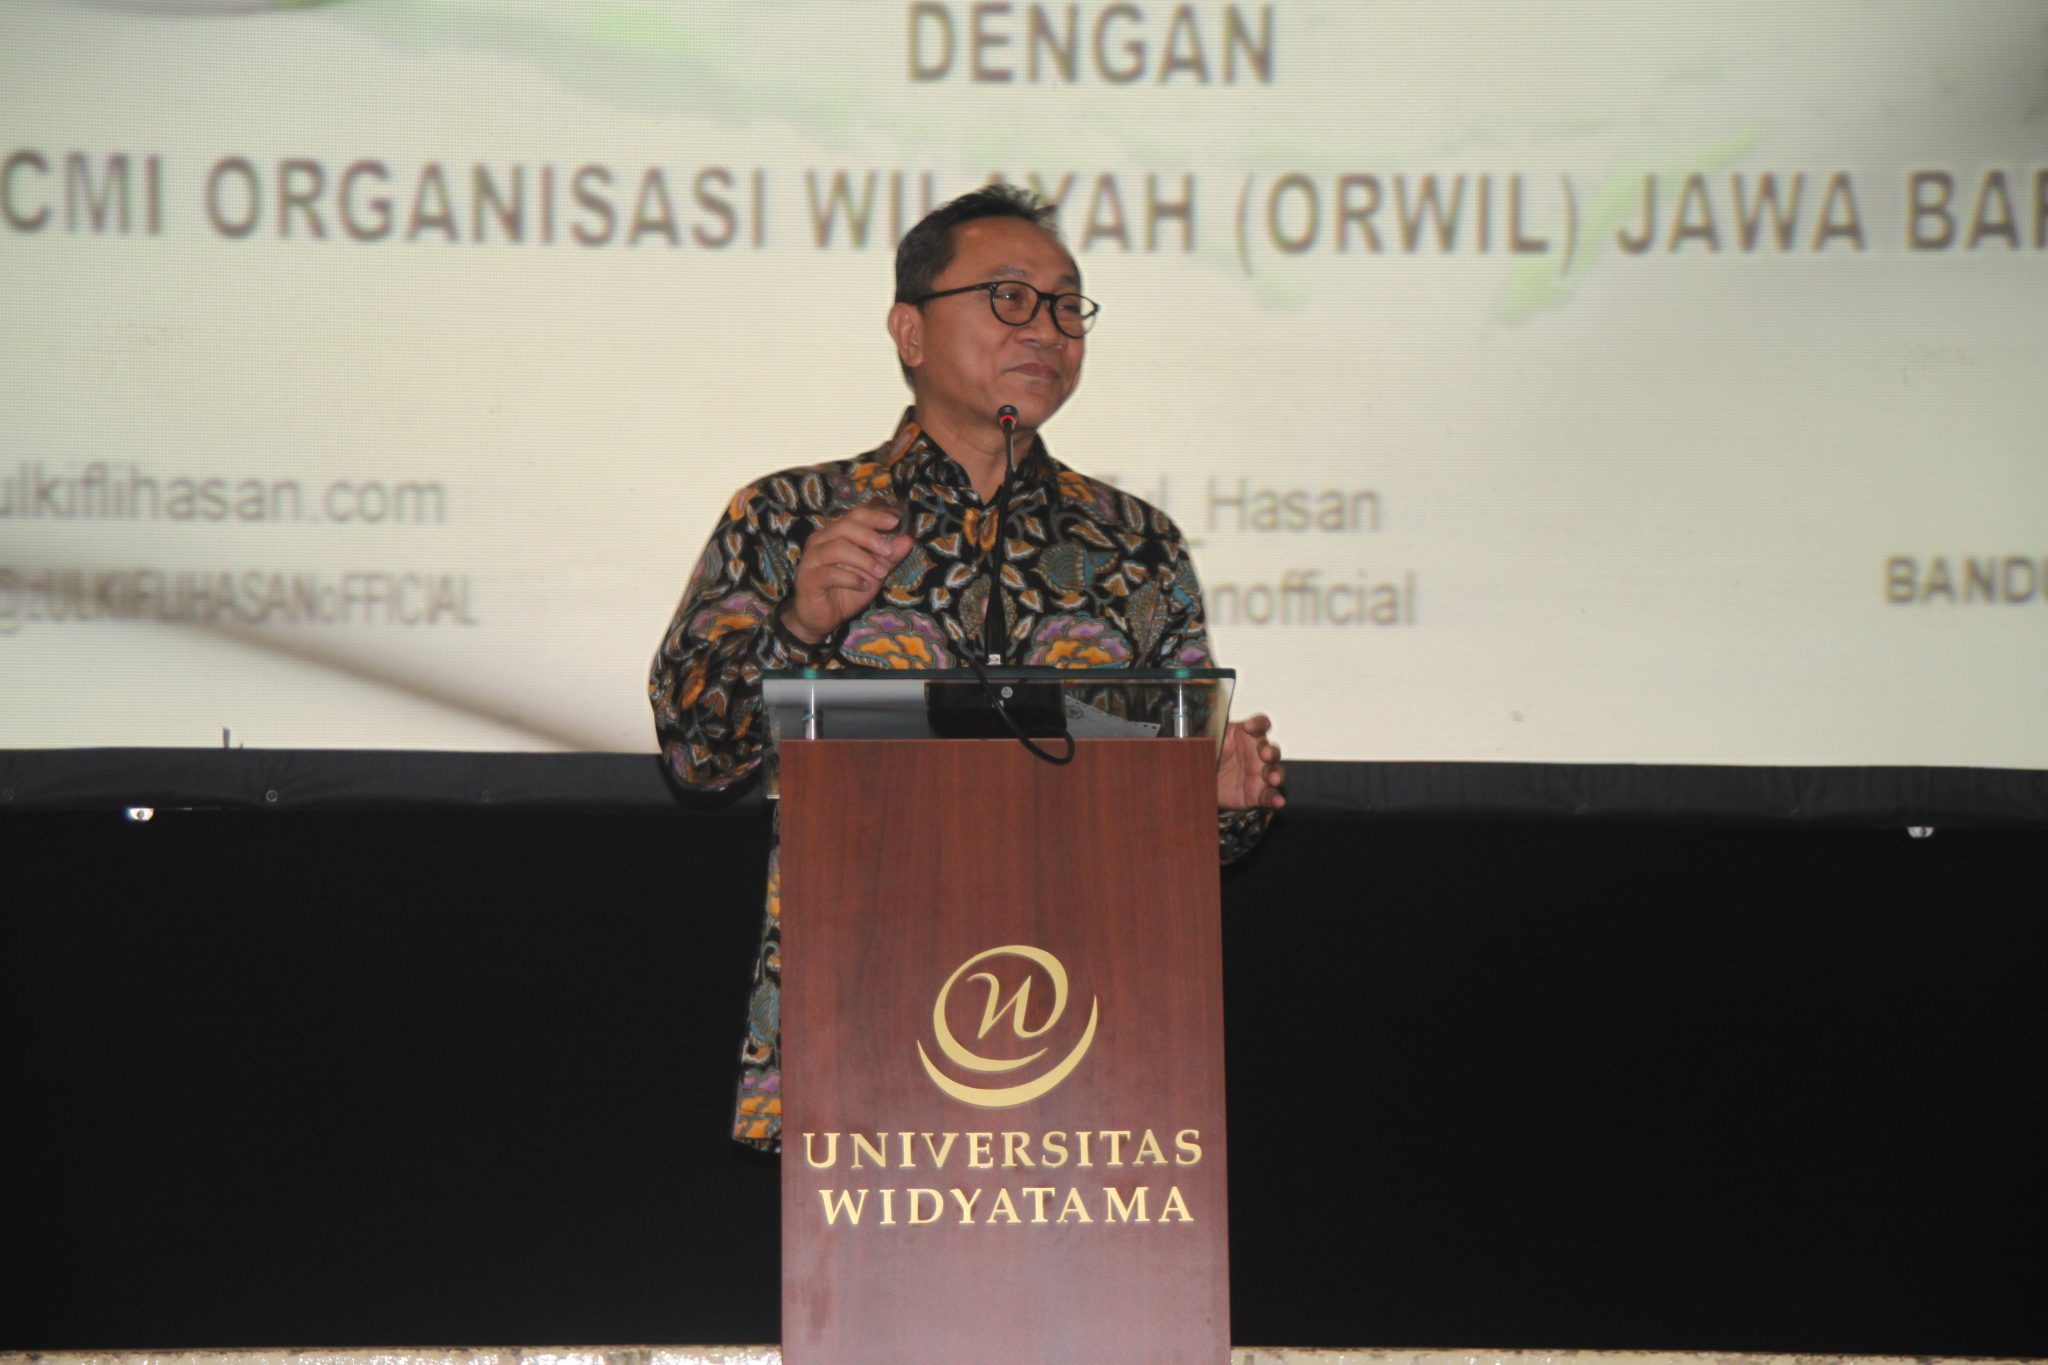 Ketua MPR RI Bersama Ratusan Tokoh Muslim Indonesia Hadiri Halal Bihalal di Universitas Widyatama